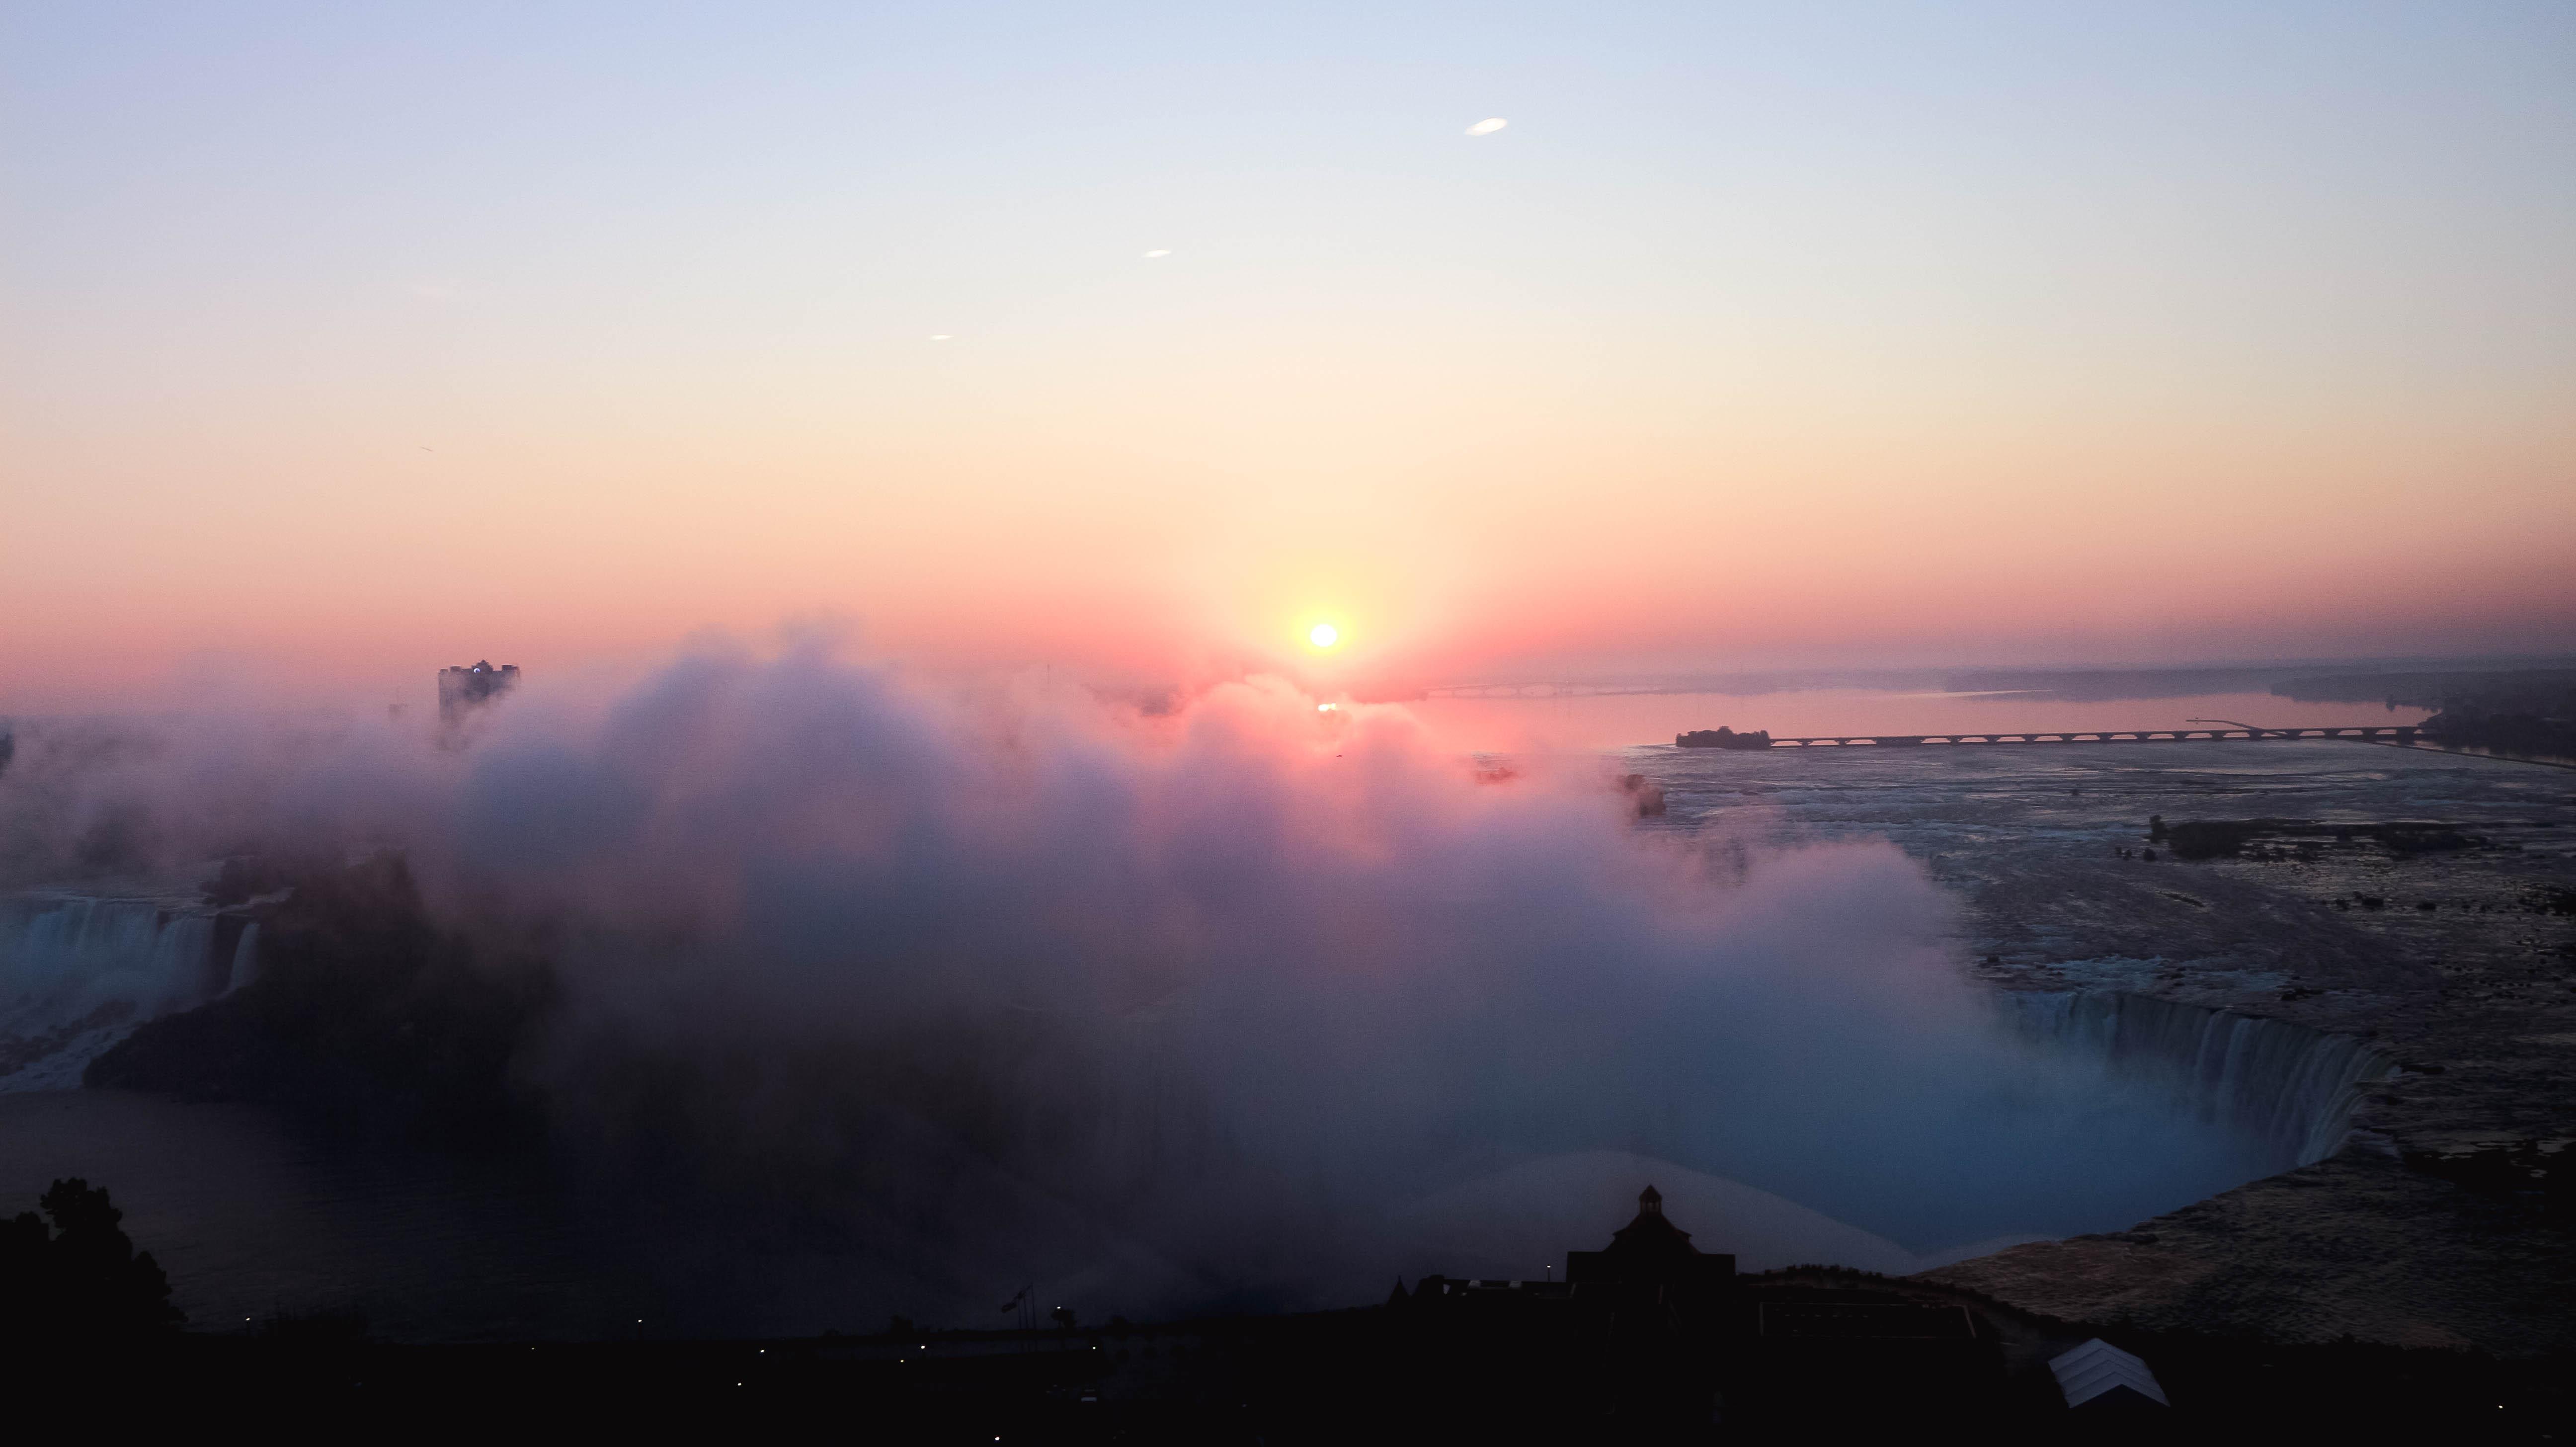 waking up in Niagara Falls blog